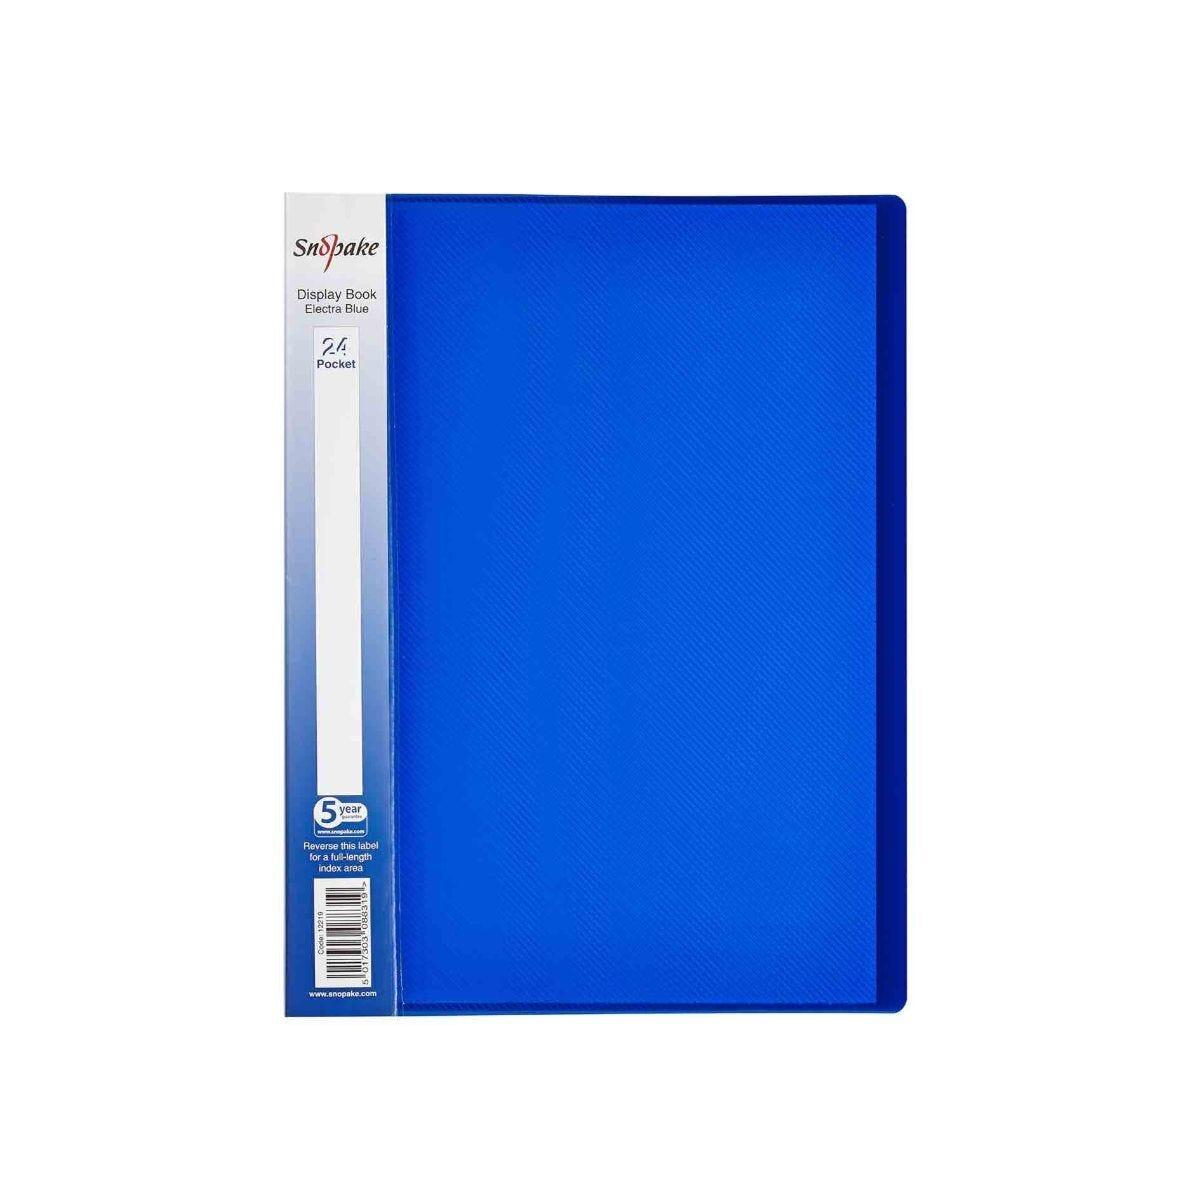 Snopake Polyfile Display Book A4 24 Pocket Pack of 5 Blue